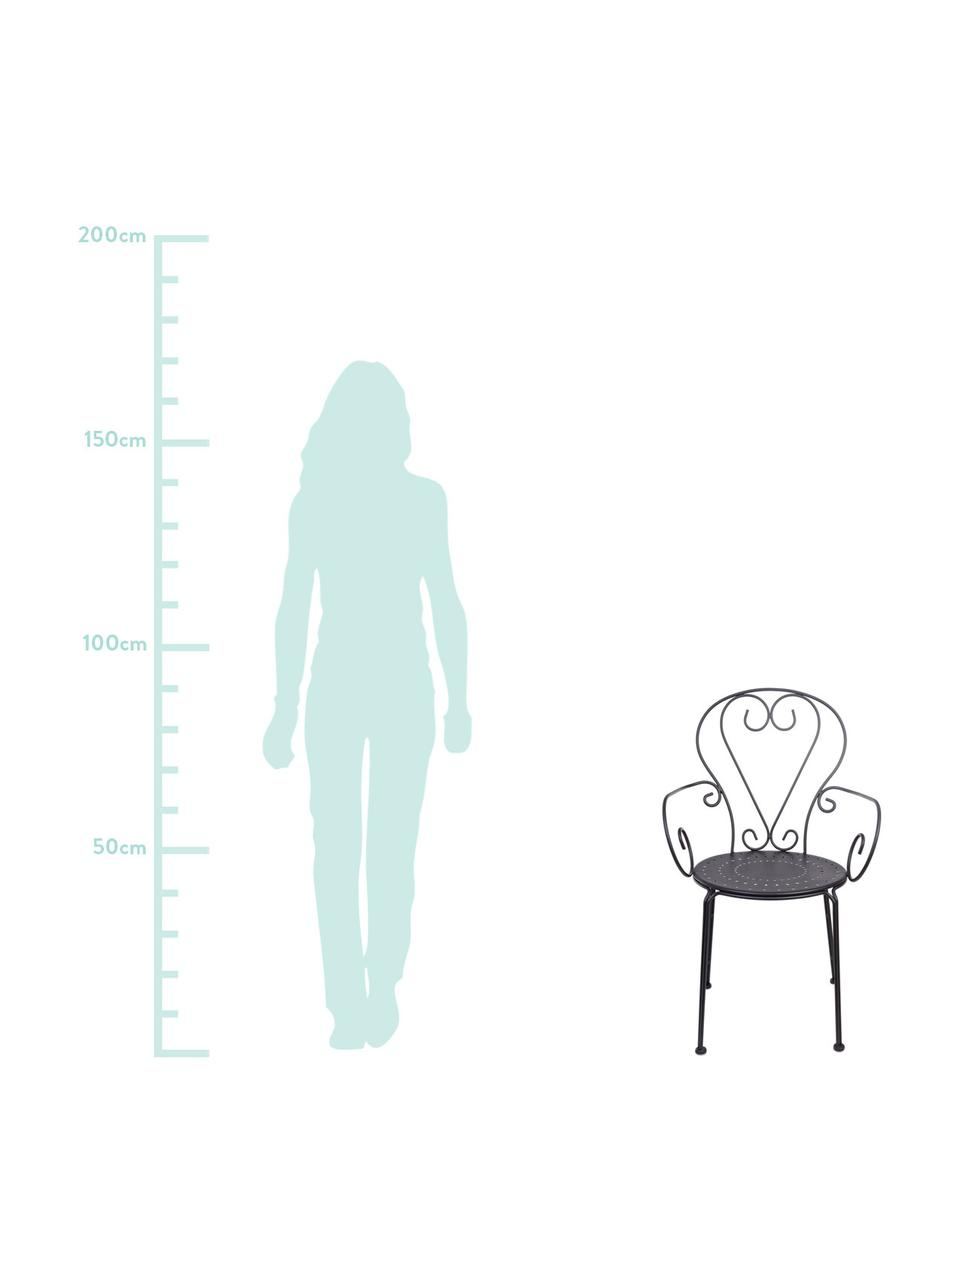 Sedia con braccioli da giardino Etienne 2 pz, Grigio scuro, Larg. 49 x Alt. 89 cm